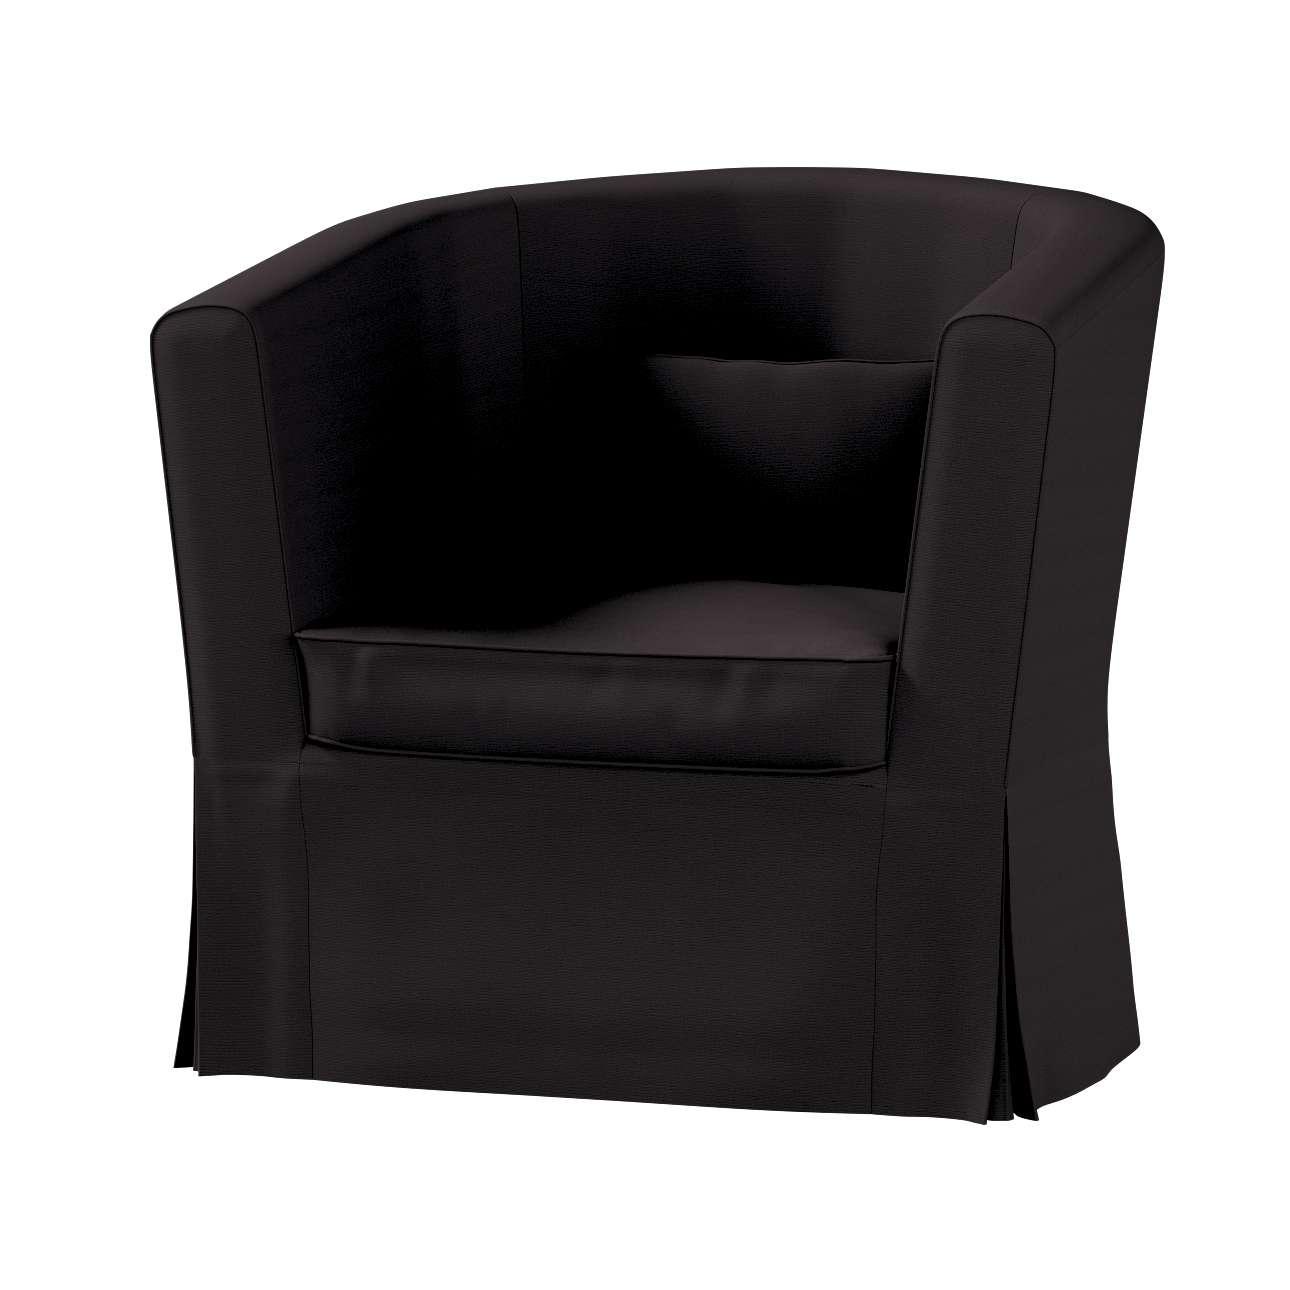 Ektorp Tullsta Sesselbezug Sesselhusse, Ektorp Tullsta von der Kollektion Cotton Panama, Stoff: 702-08